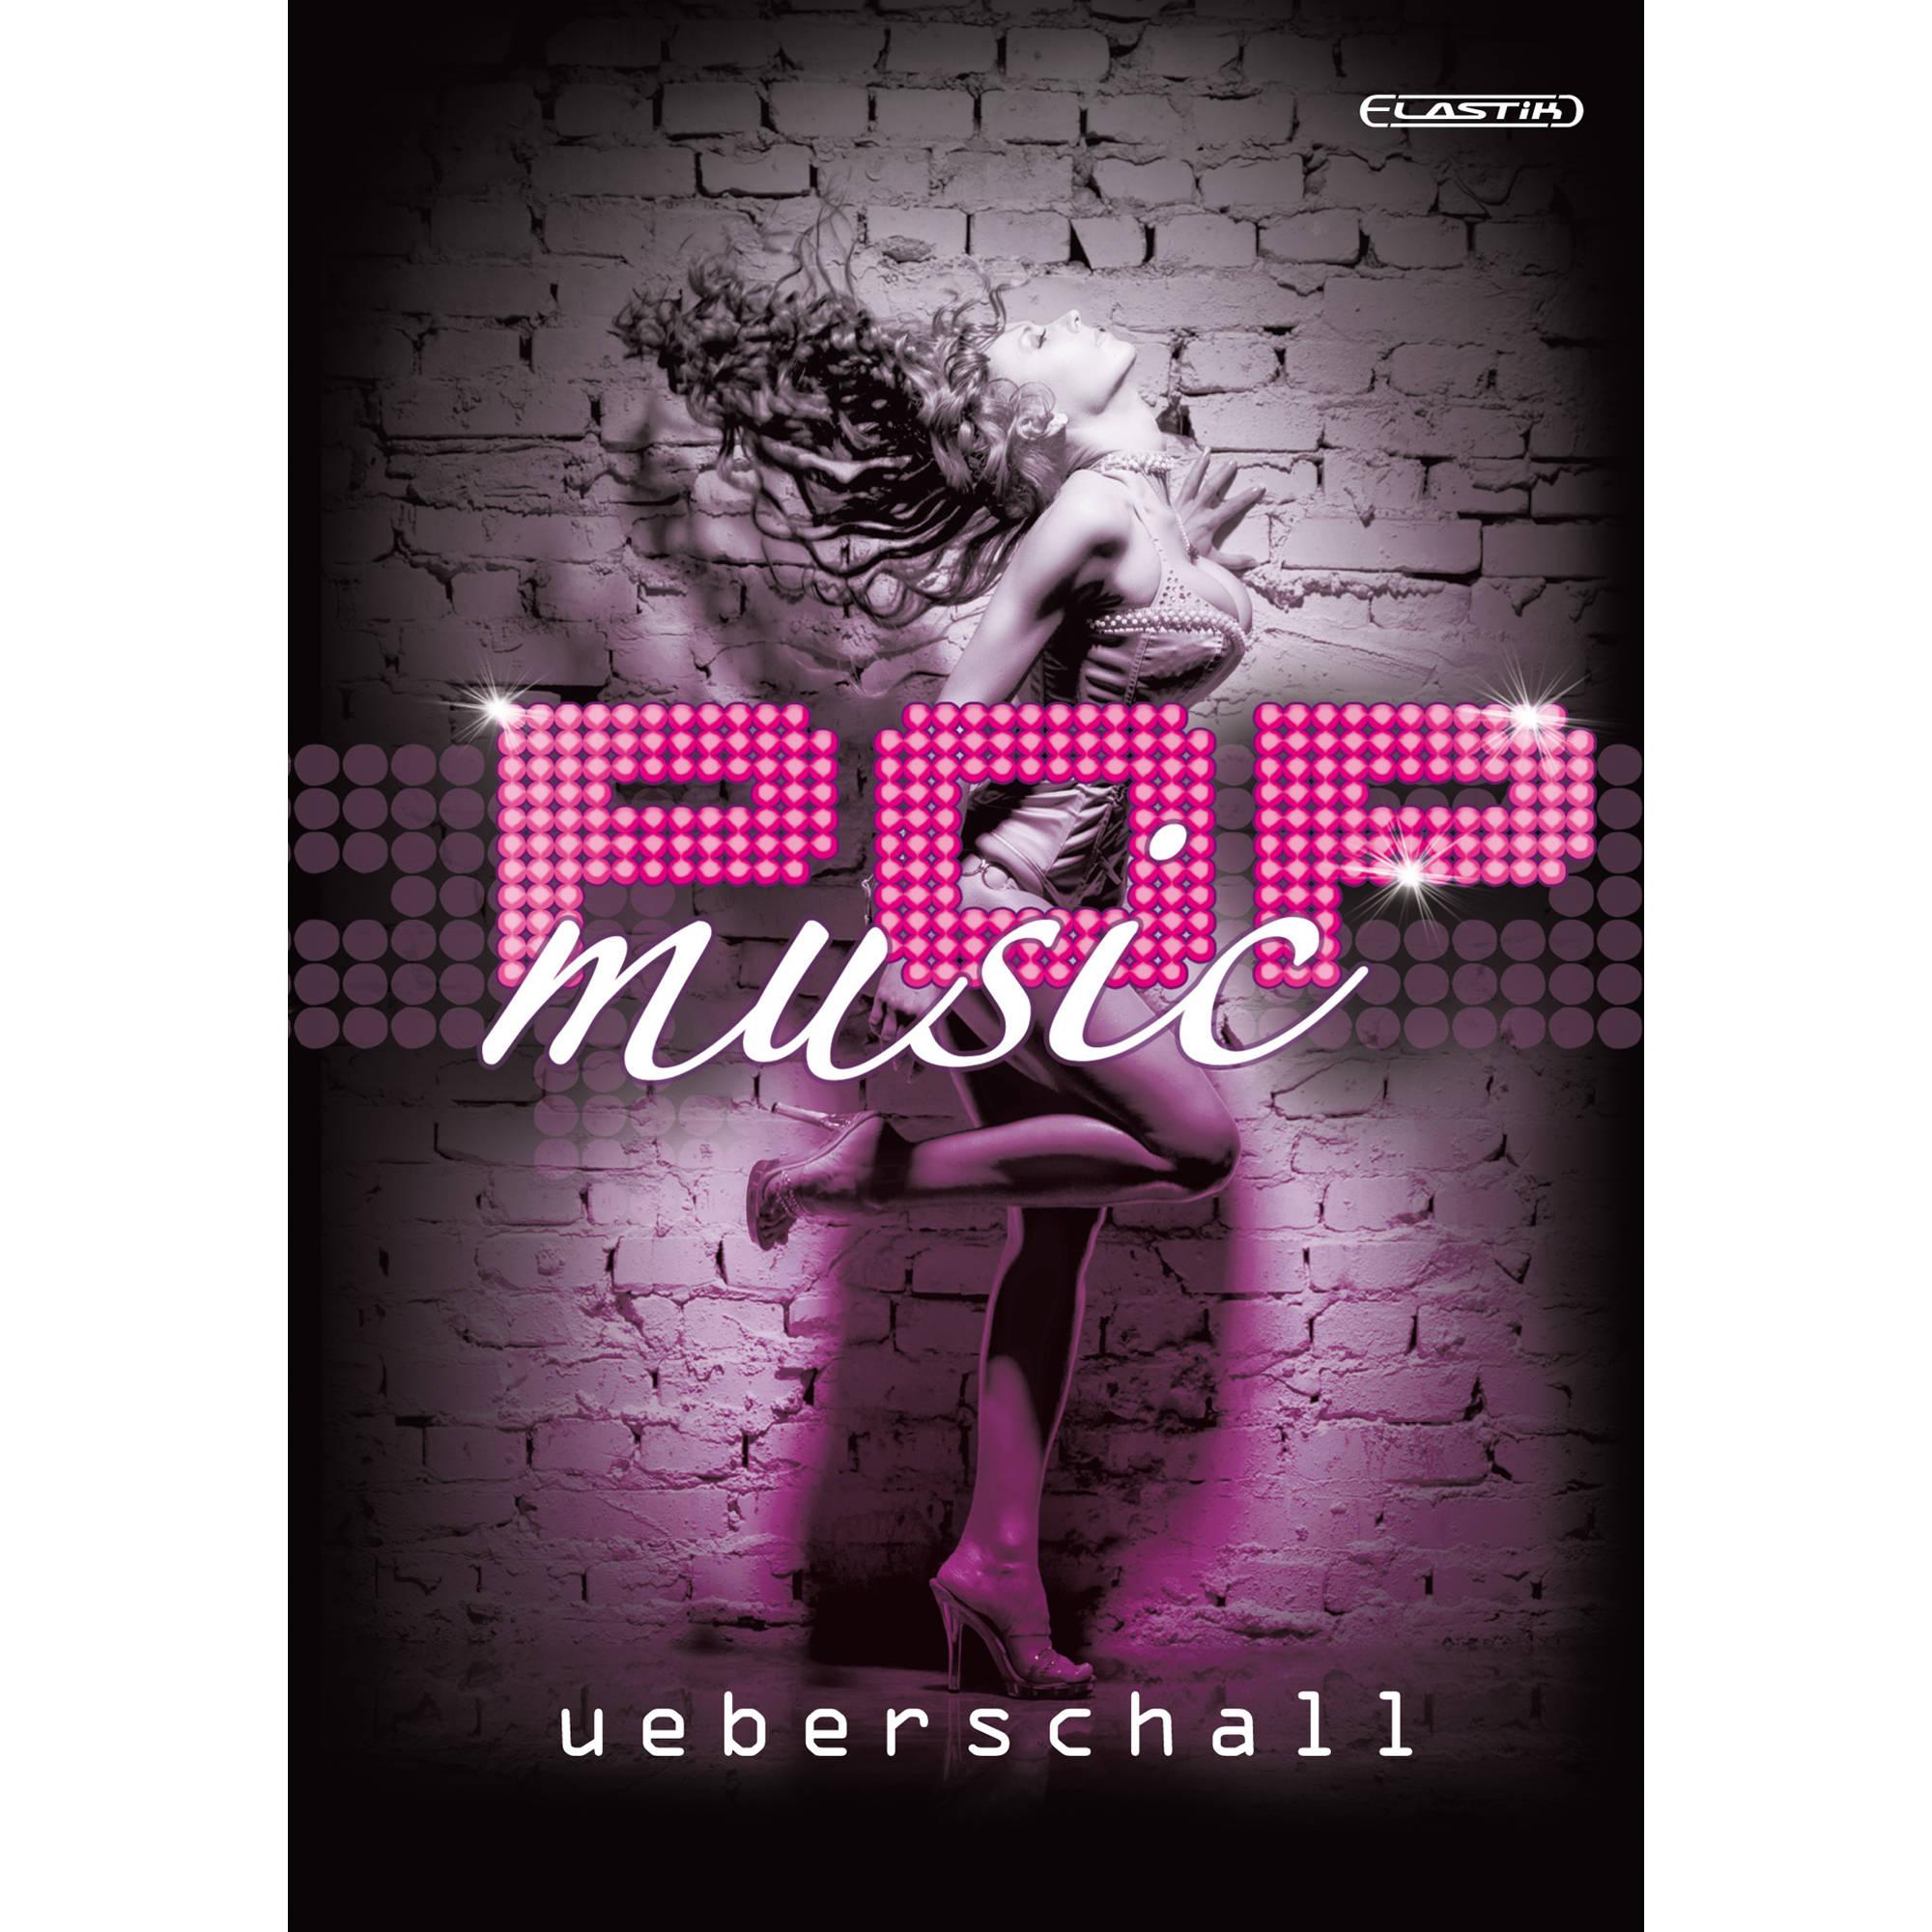 Big fish audio dvd pop music popm1 pw b h photo video for Big fish musical soundtrack